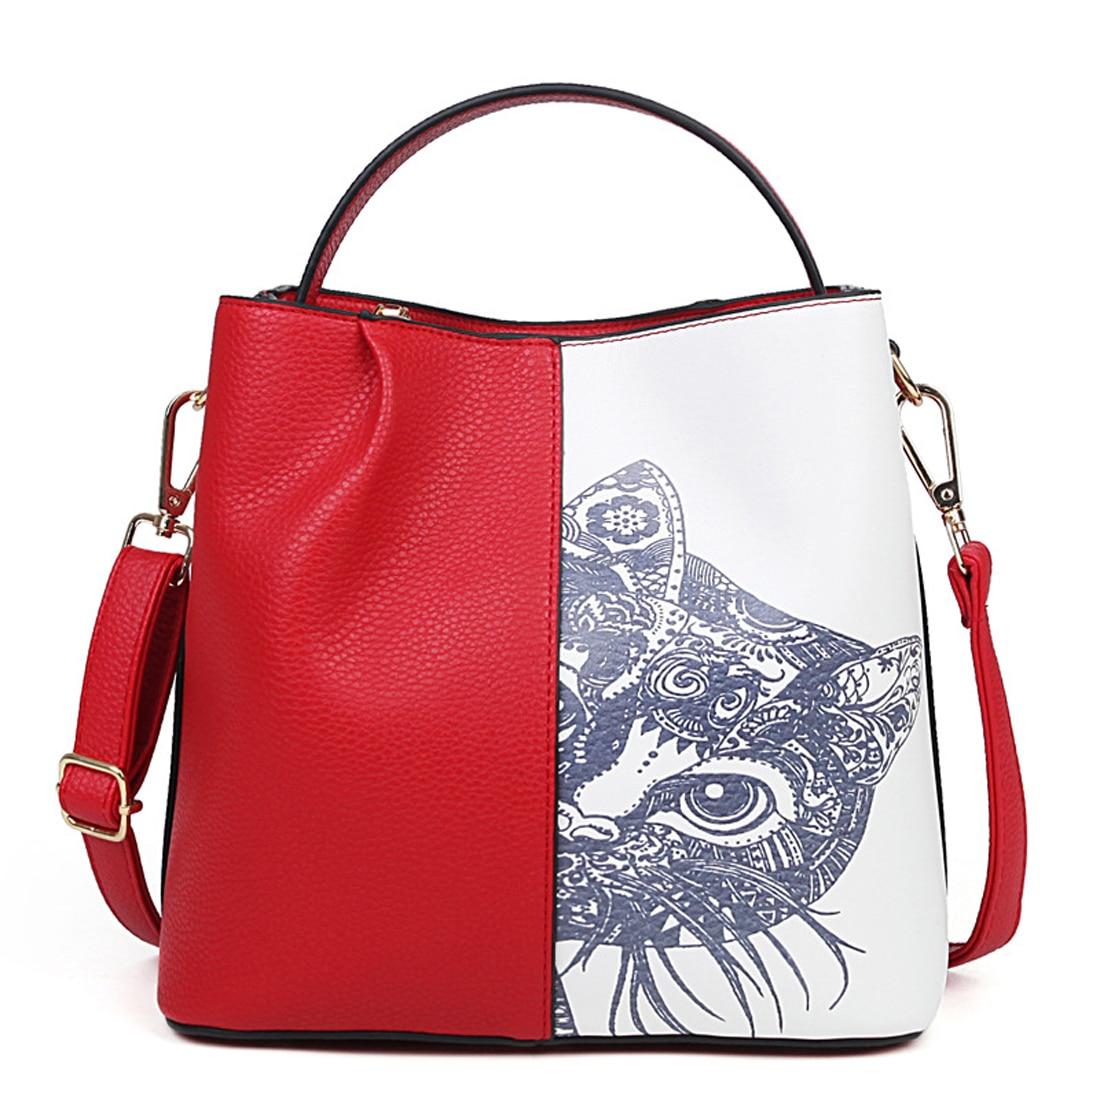 2017 Cat Printed PU Leather Large Capacity Women Bag Fashion High Quality Ladies Handbags Tote Bag